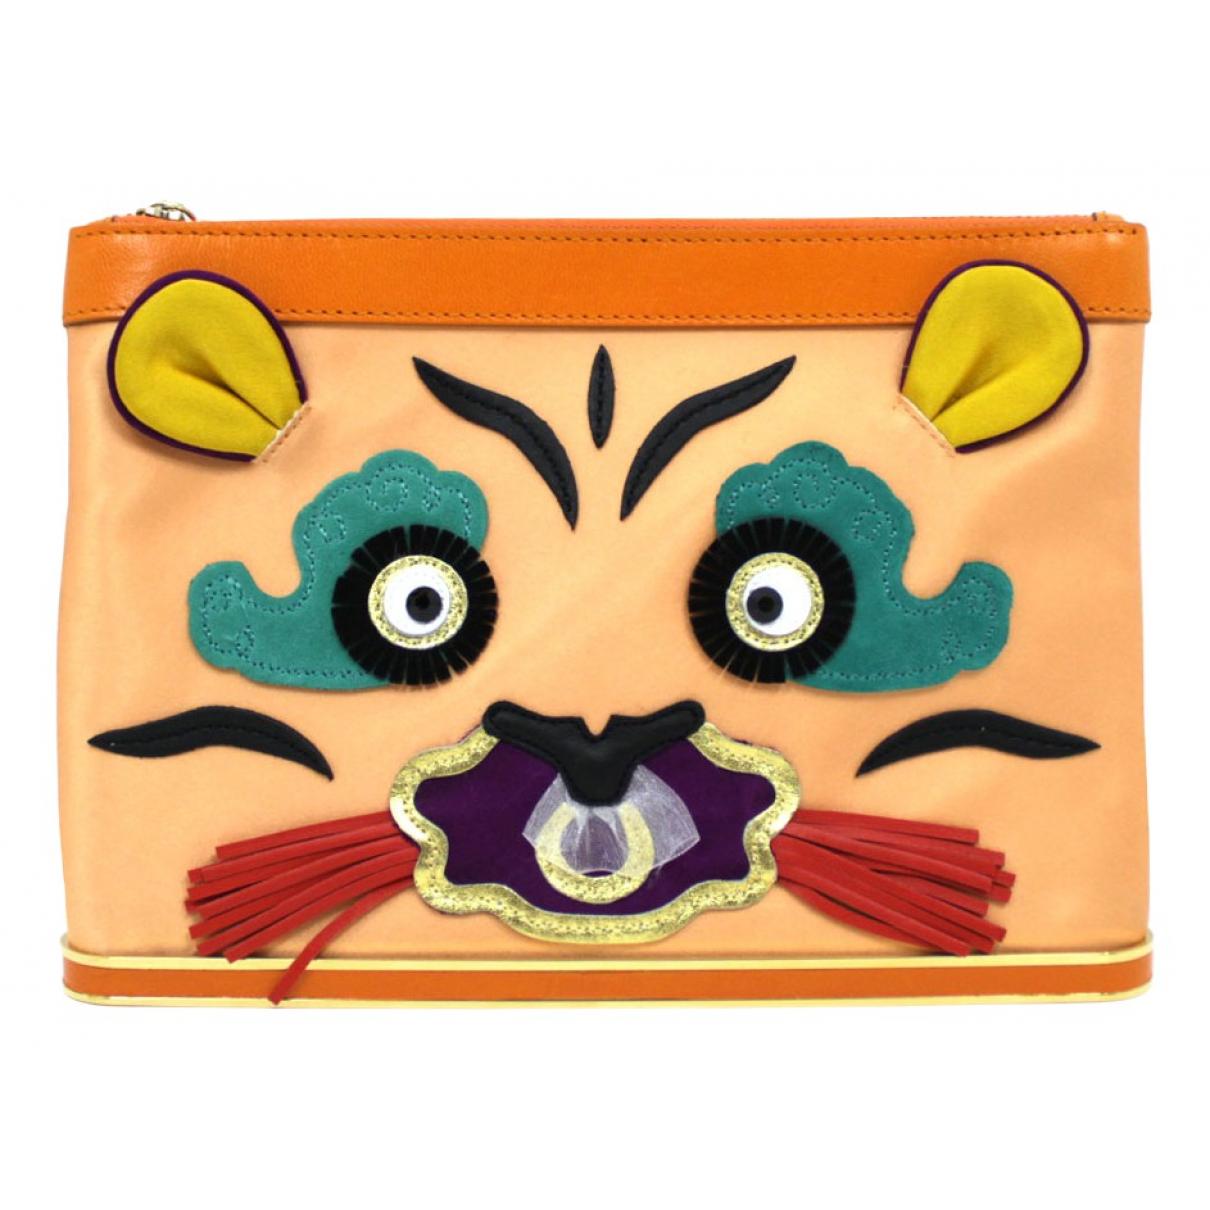 Charlotte Olympia - Pochette   pour femme en toile - orange